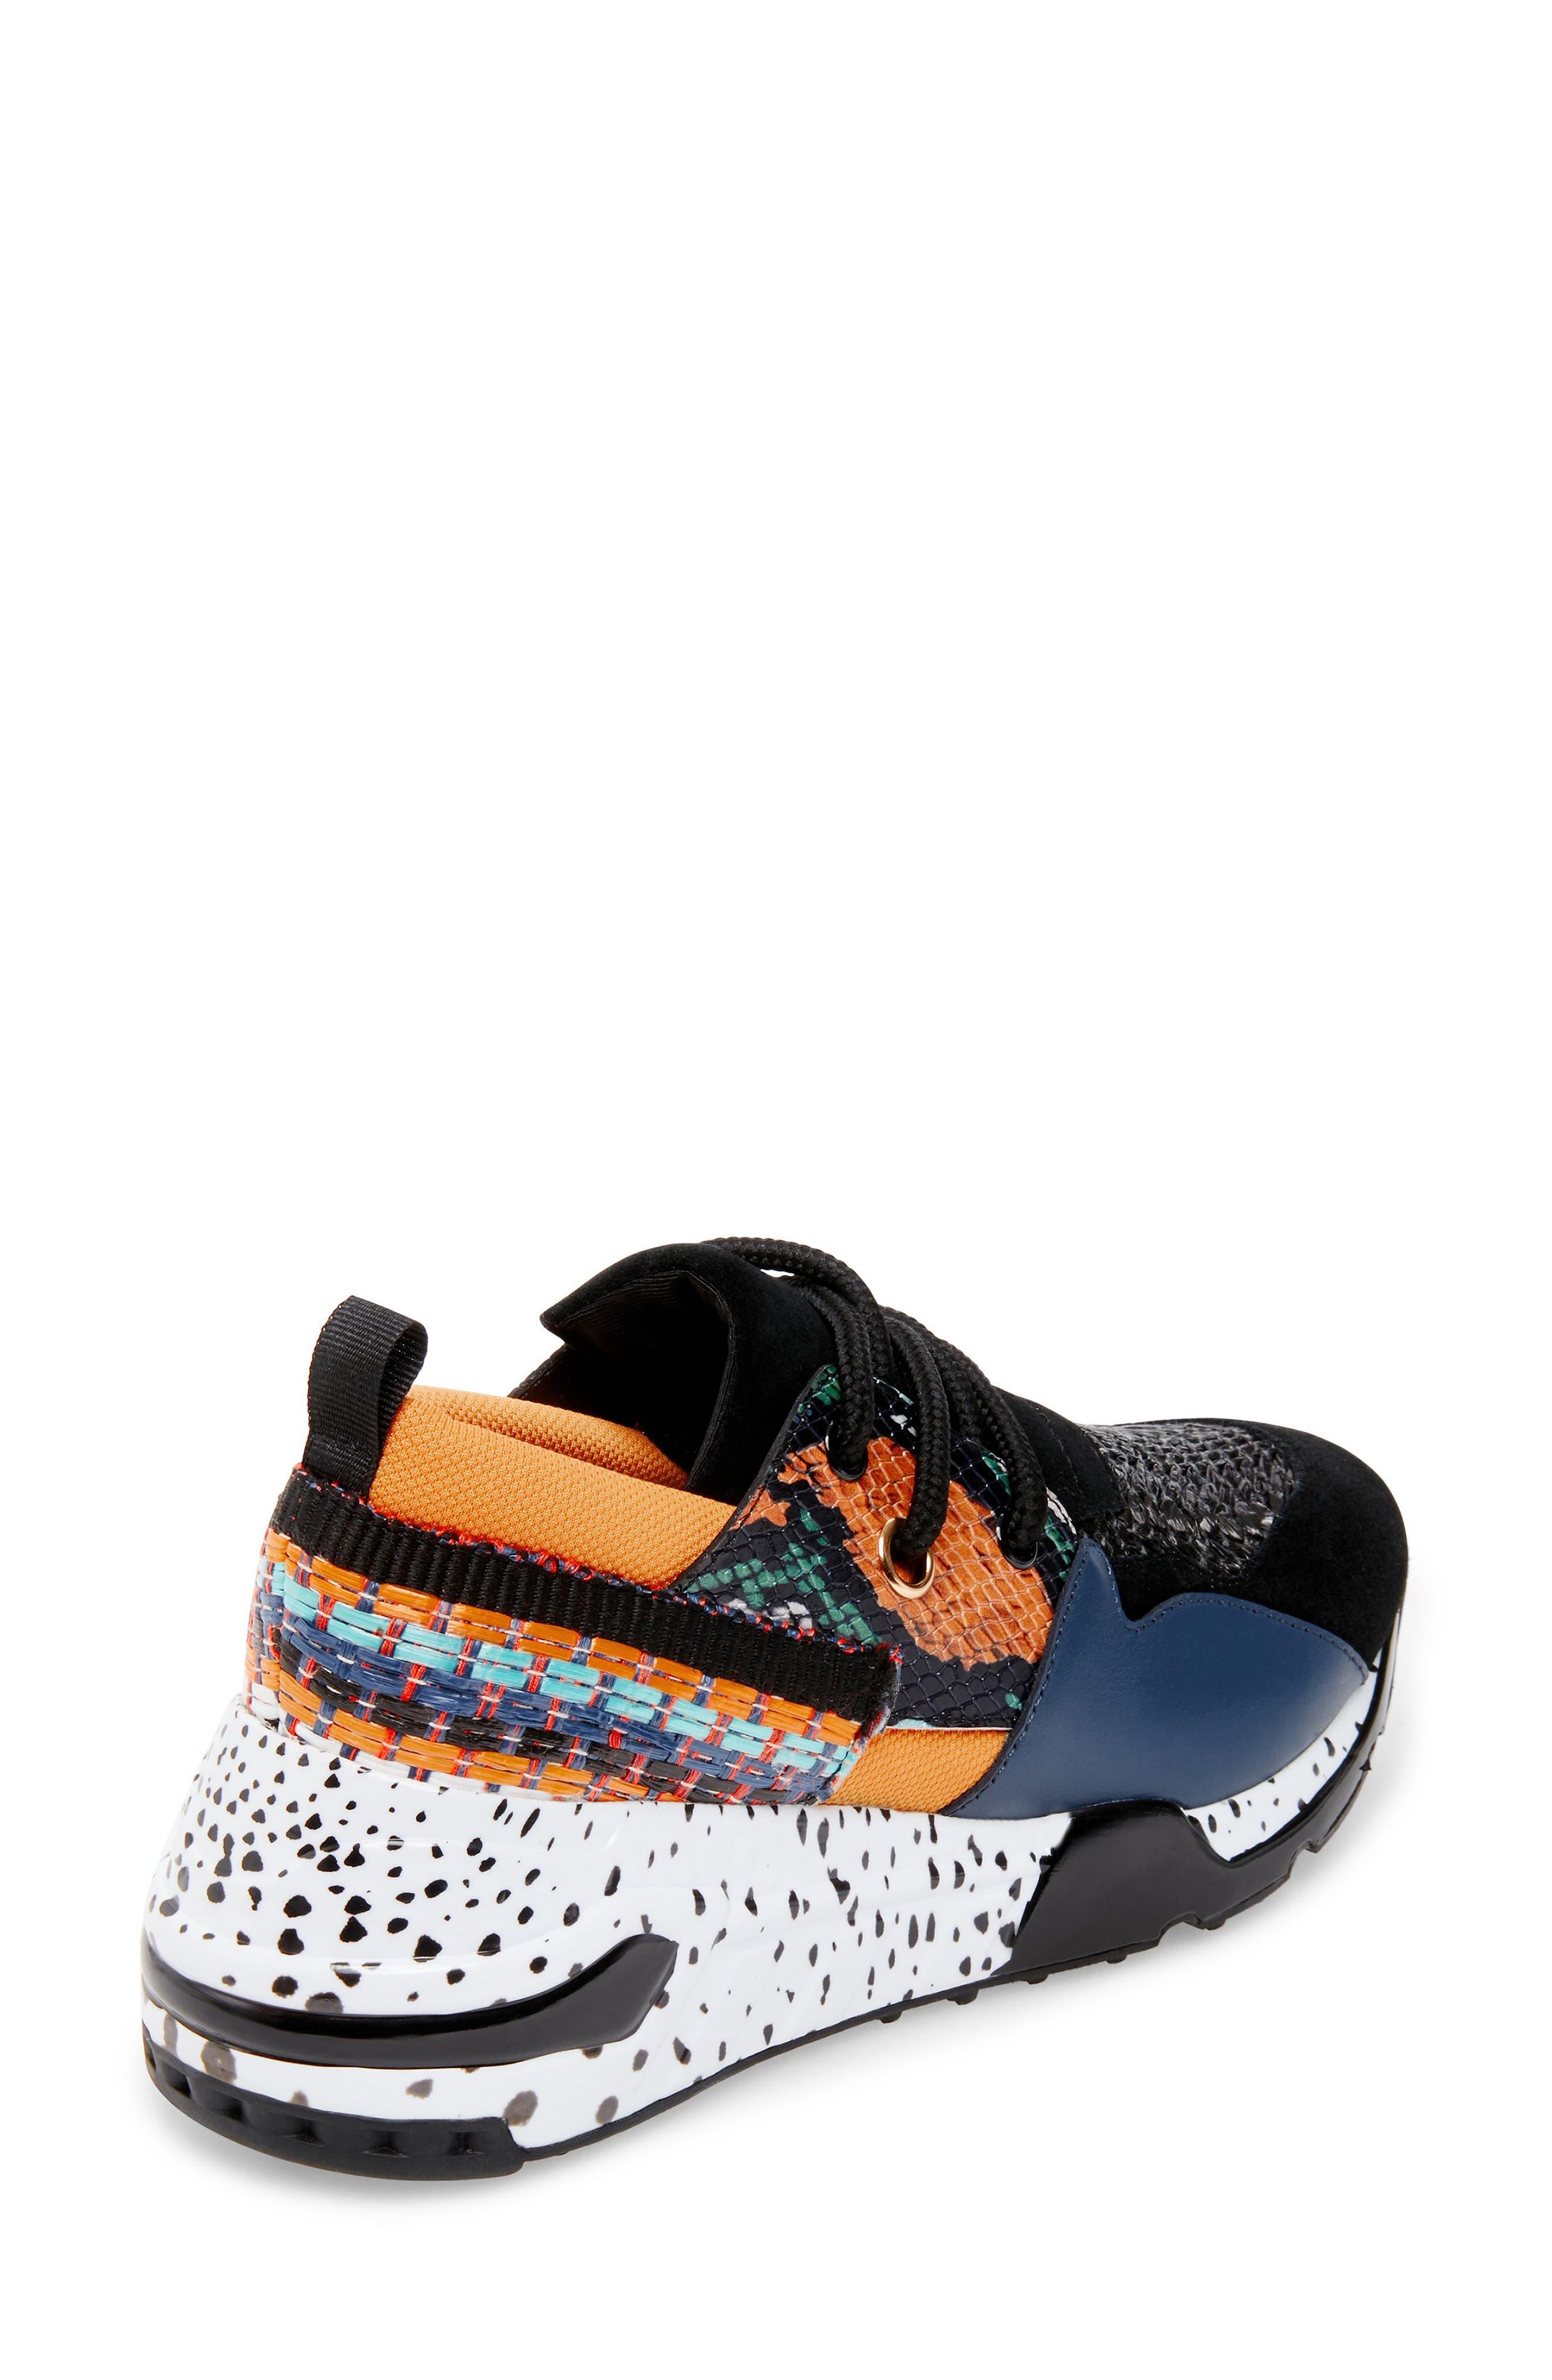 Cliff Sneaker,                             Alternate thumbnail 2, color,                             ORANGE MULTICOLOR